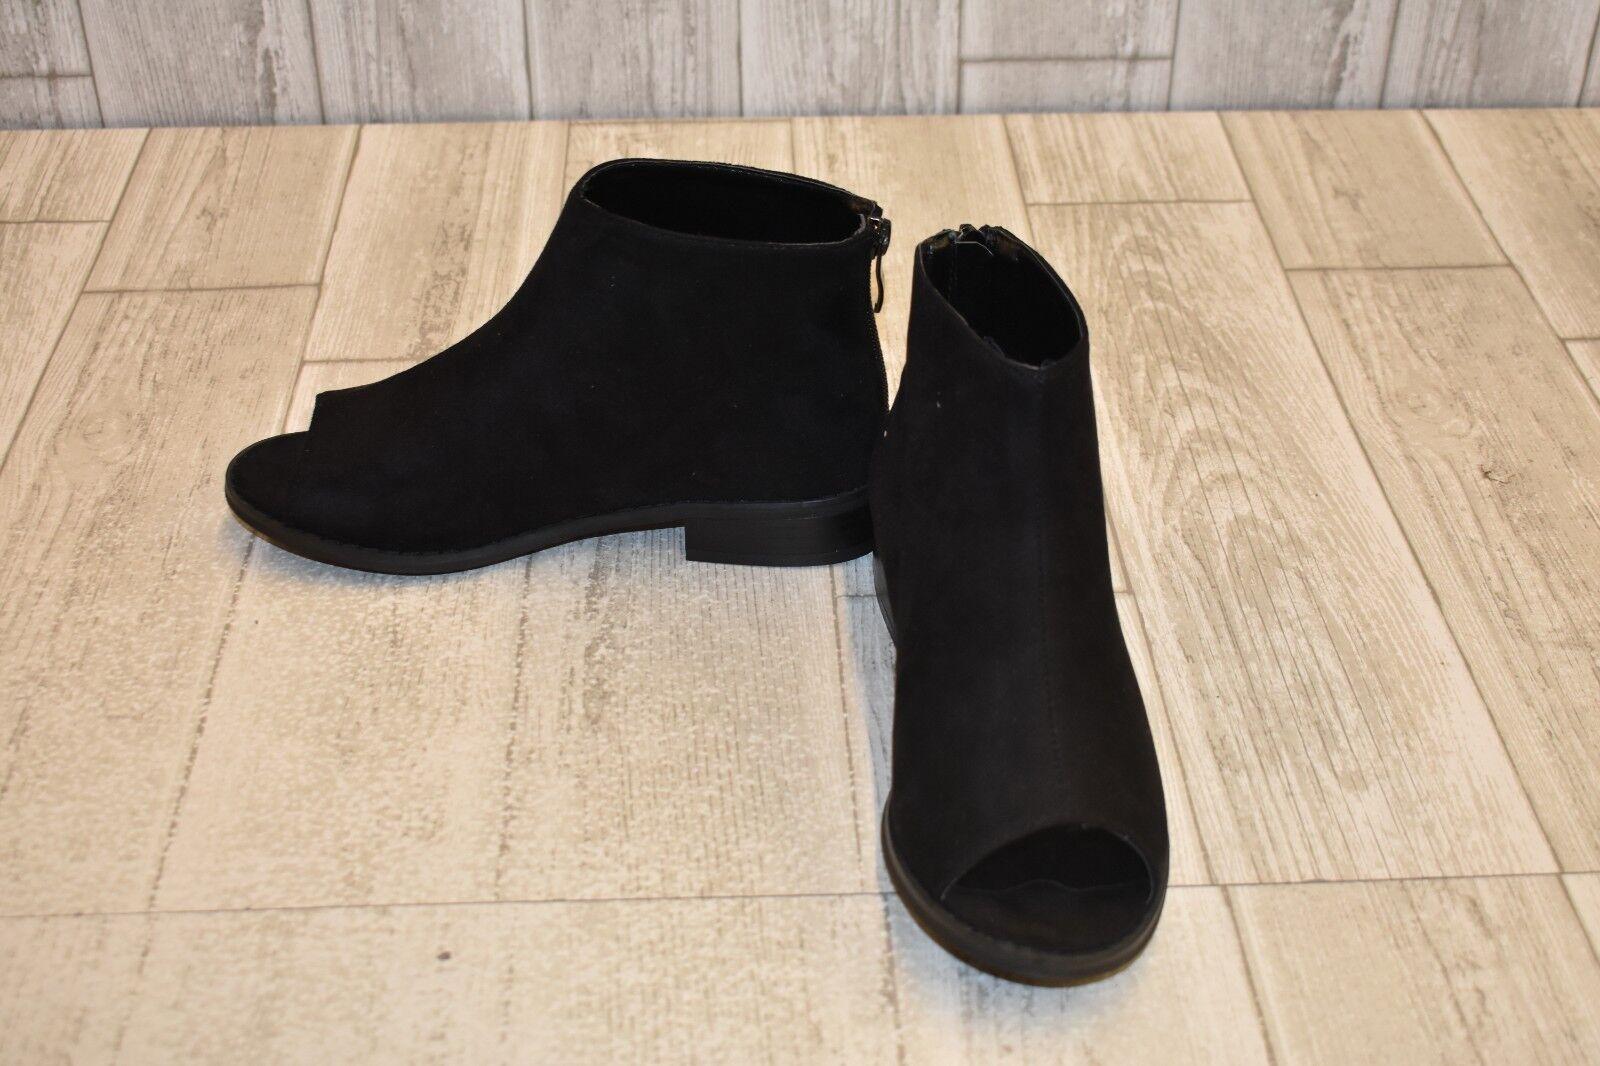 Journee Collection Reya Peep Toe Booties, Women's Size 6, Black